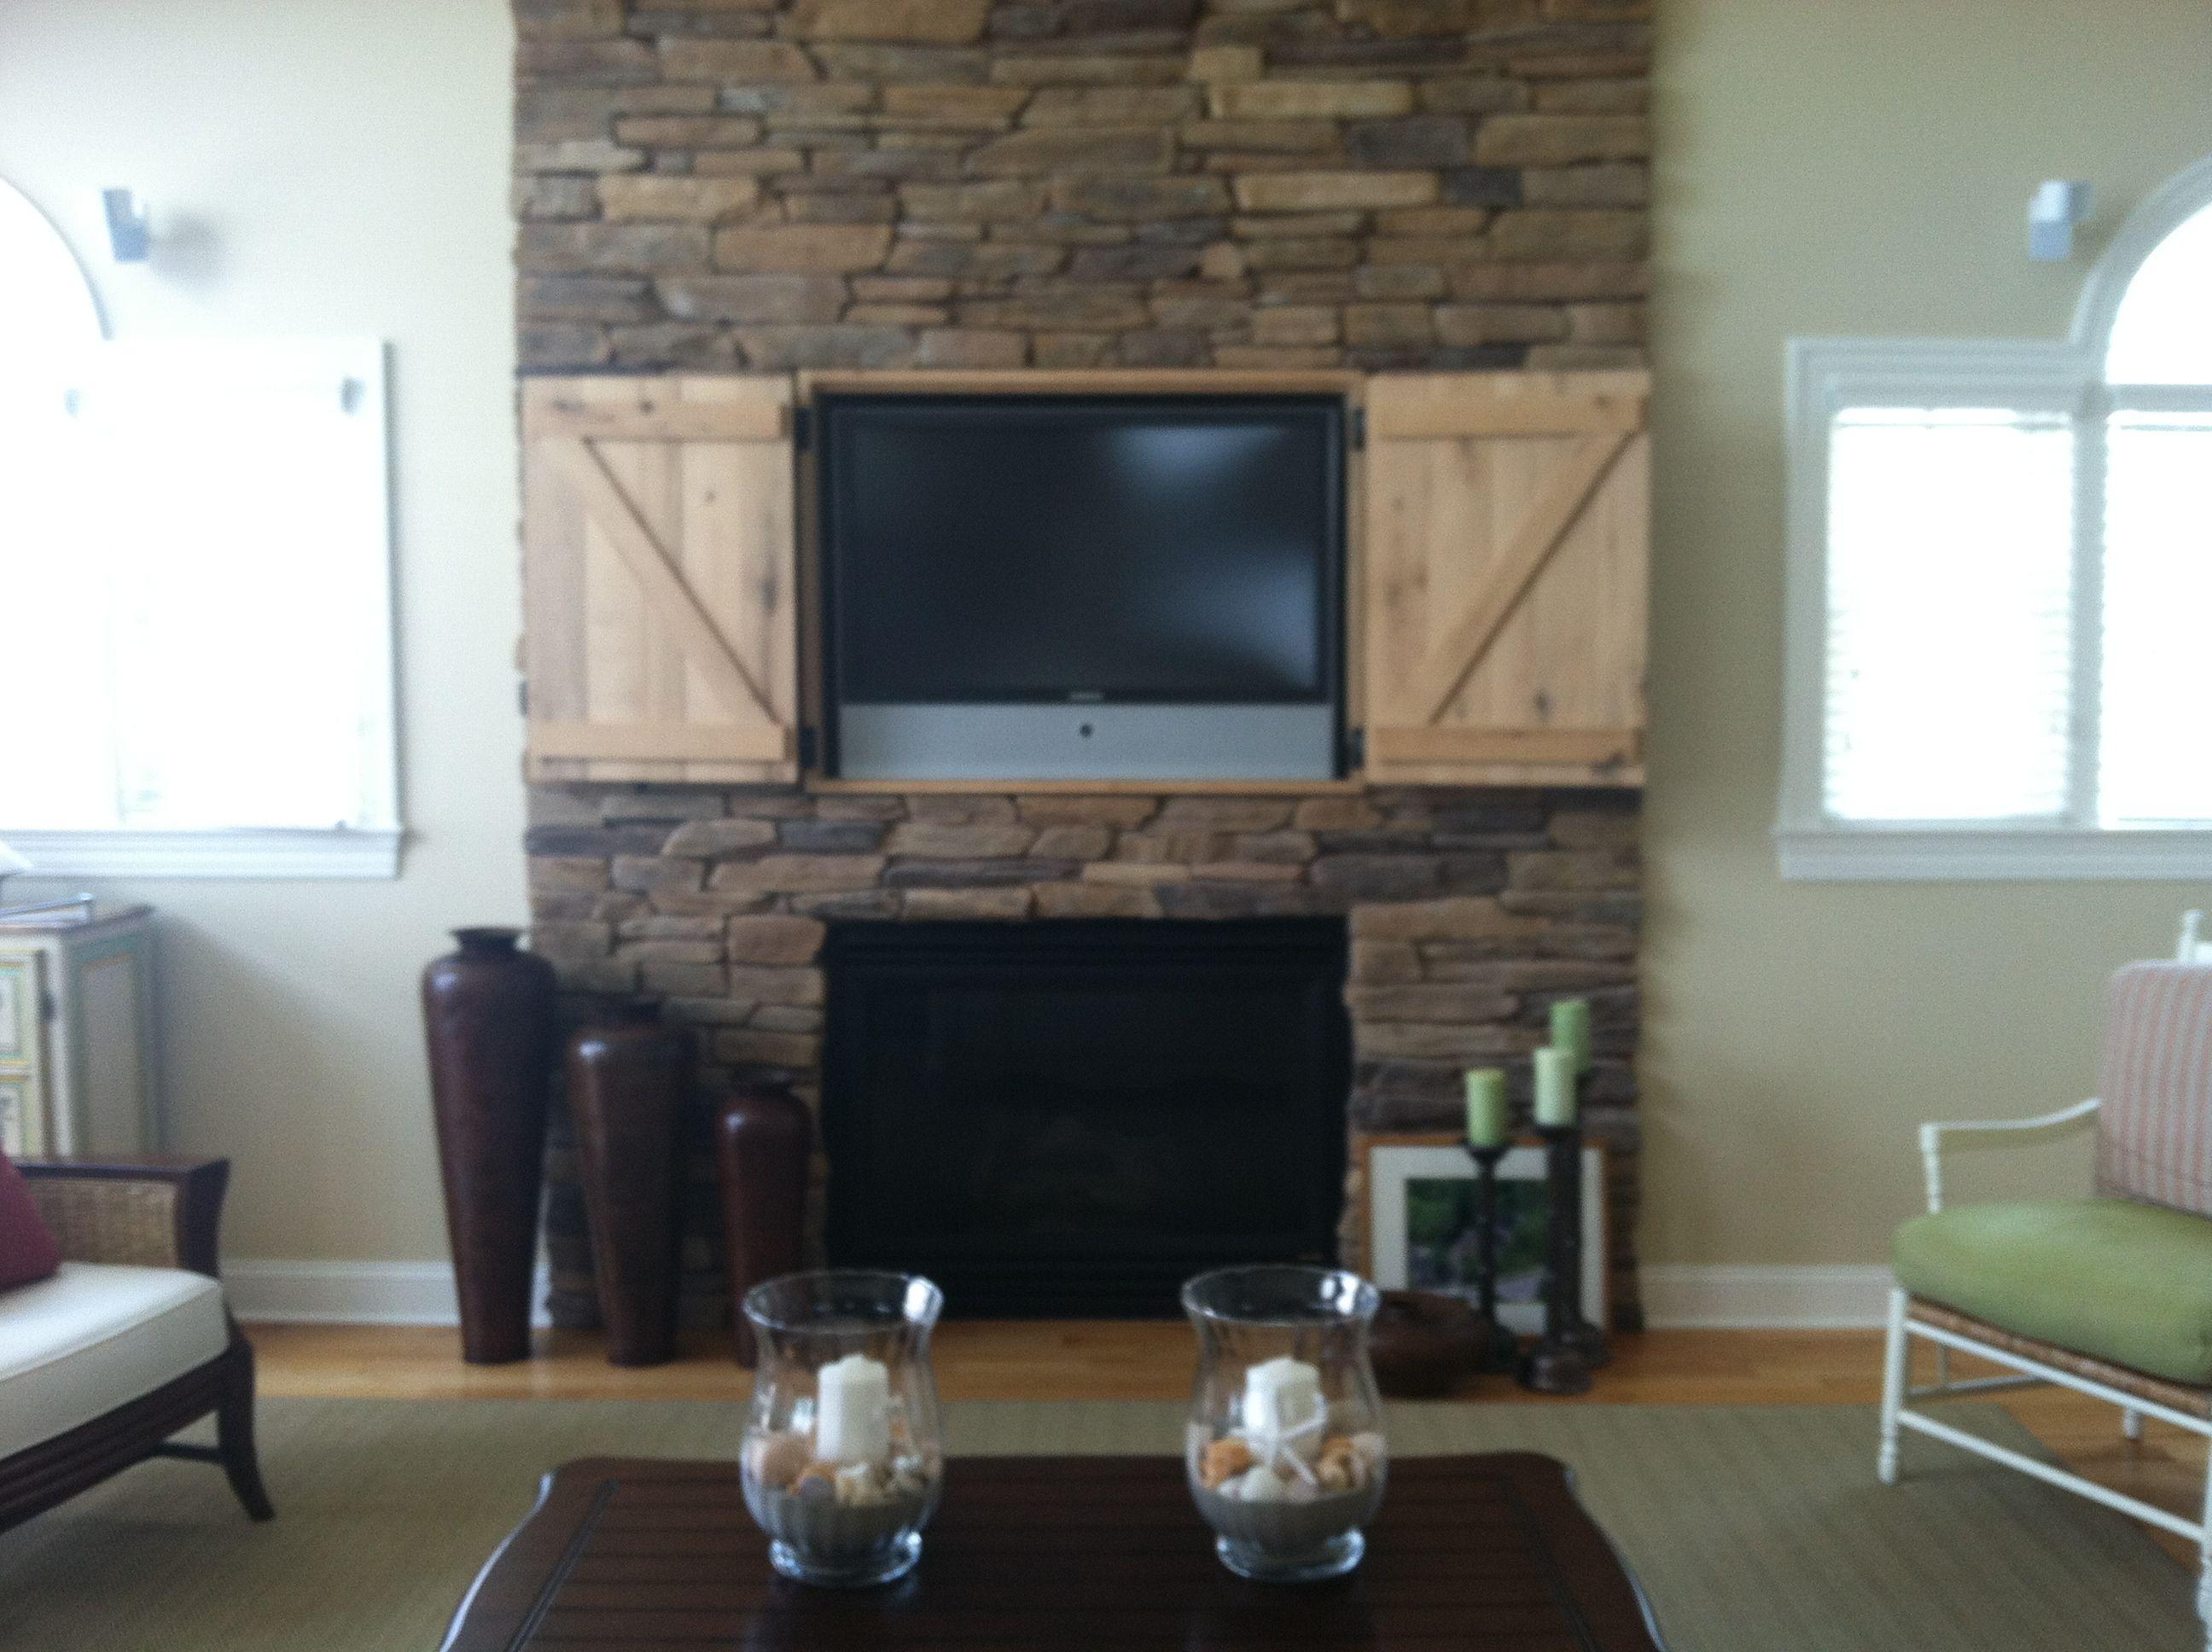 Tv Above Fireplace Decorating Ideas Elegant Hidden Tv Over Fireplace Open Doors Decor and Design